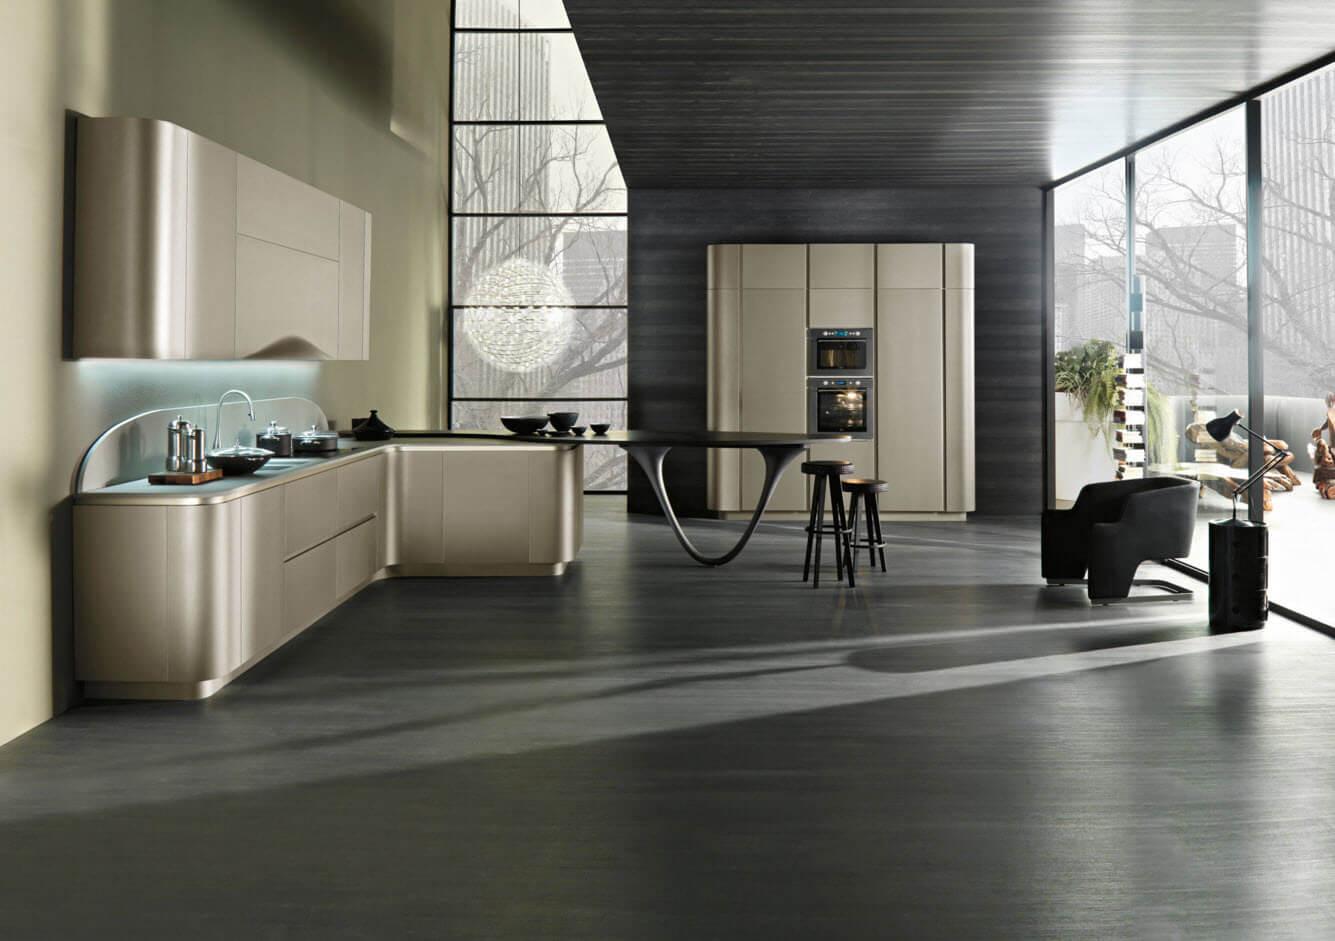 Modern kitchen with gray quartzite countertop